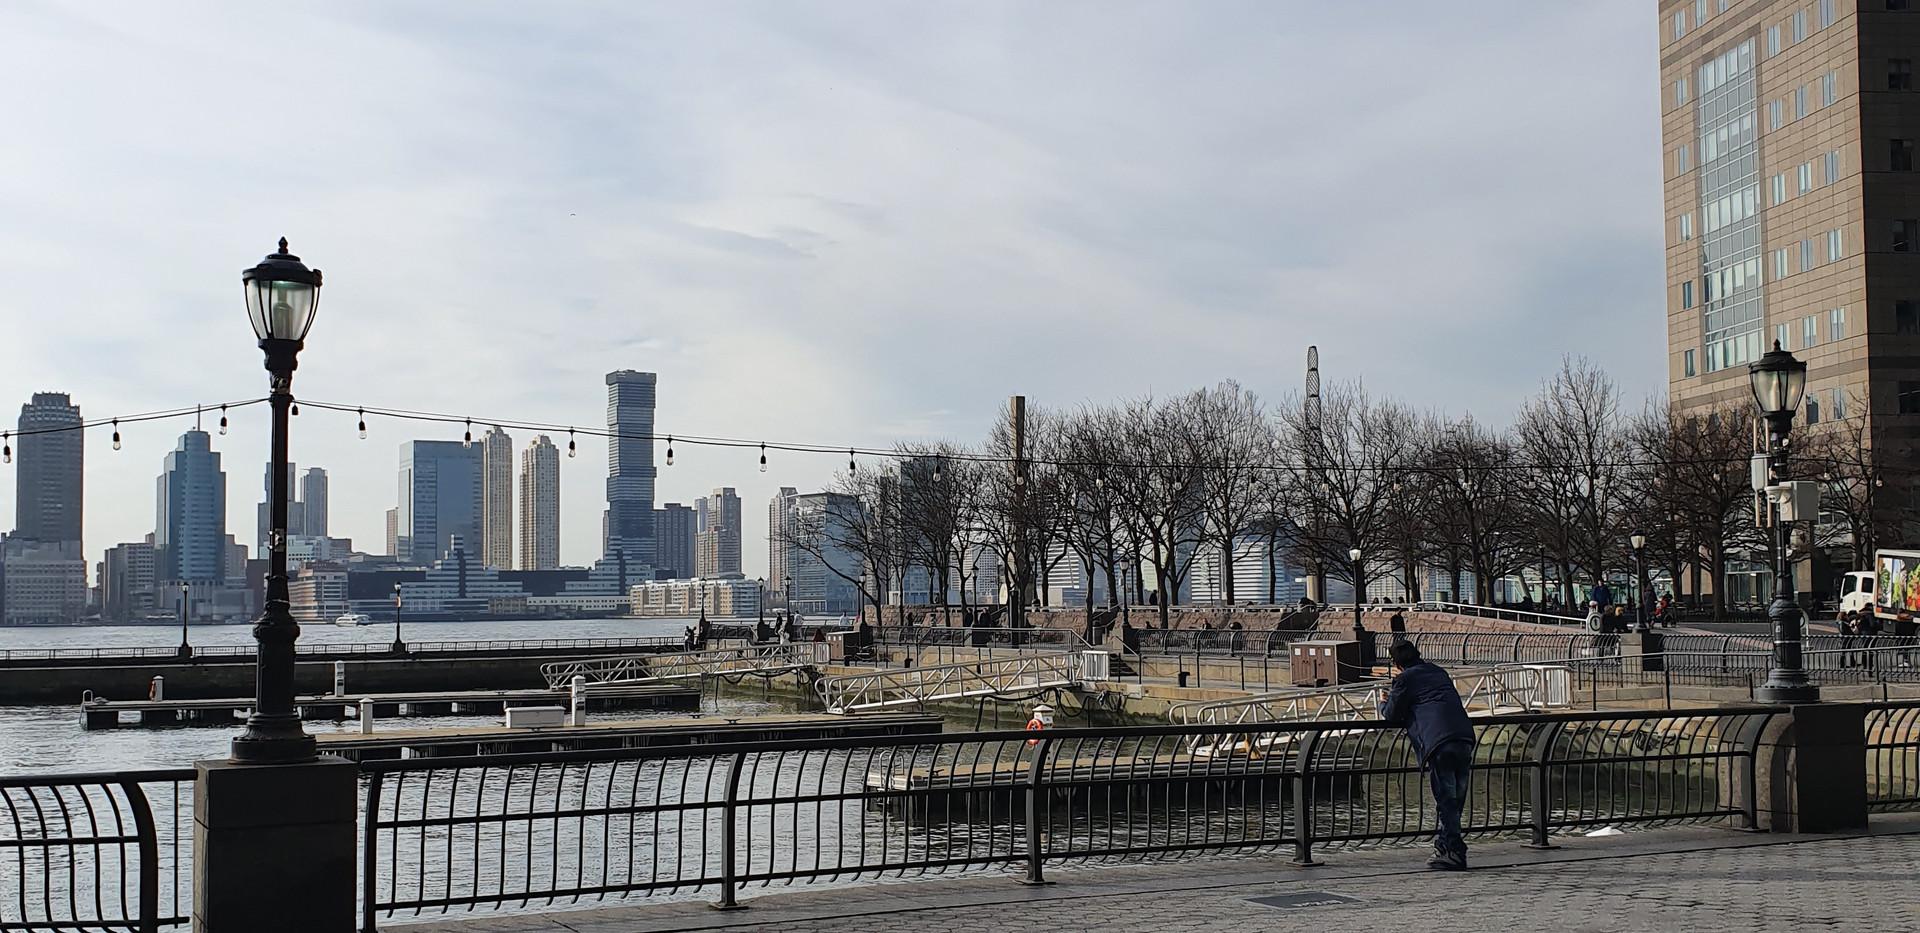 Battery Park City Esplanade - Brookfield Place